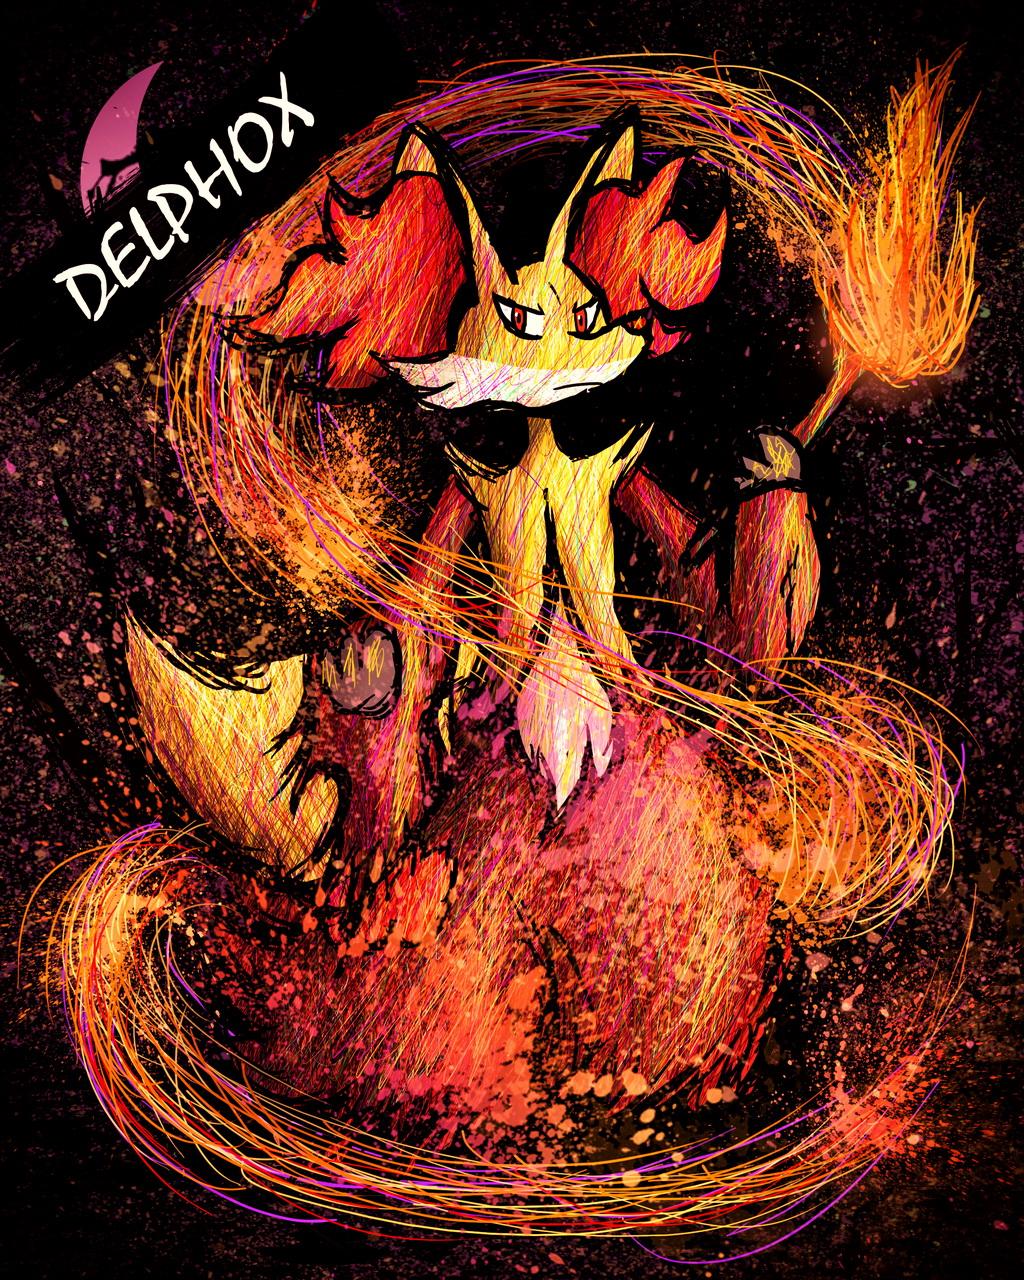 Delphox